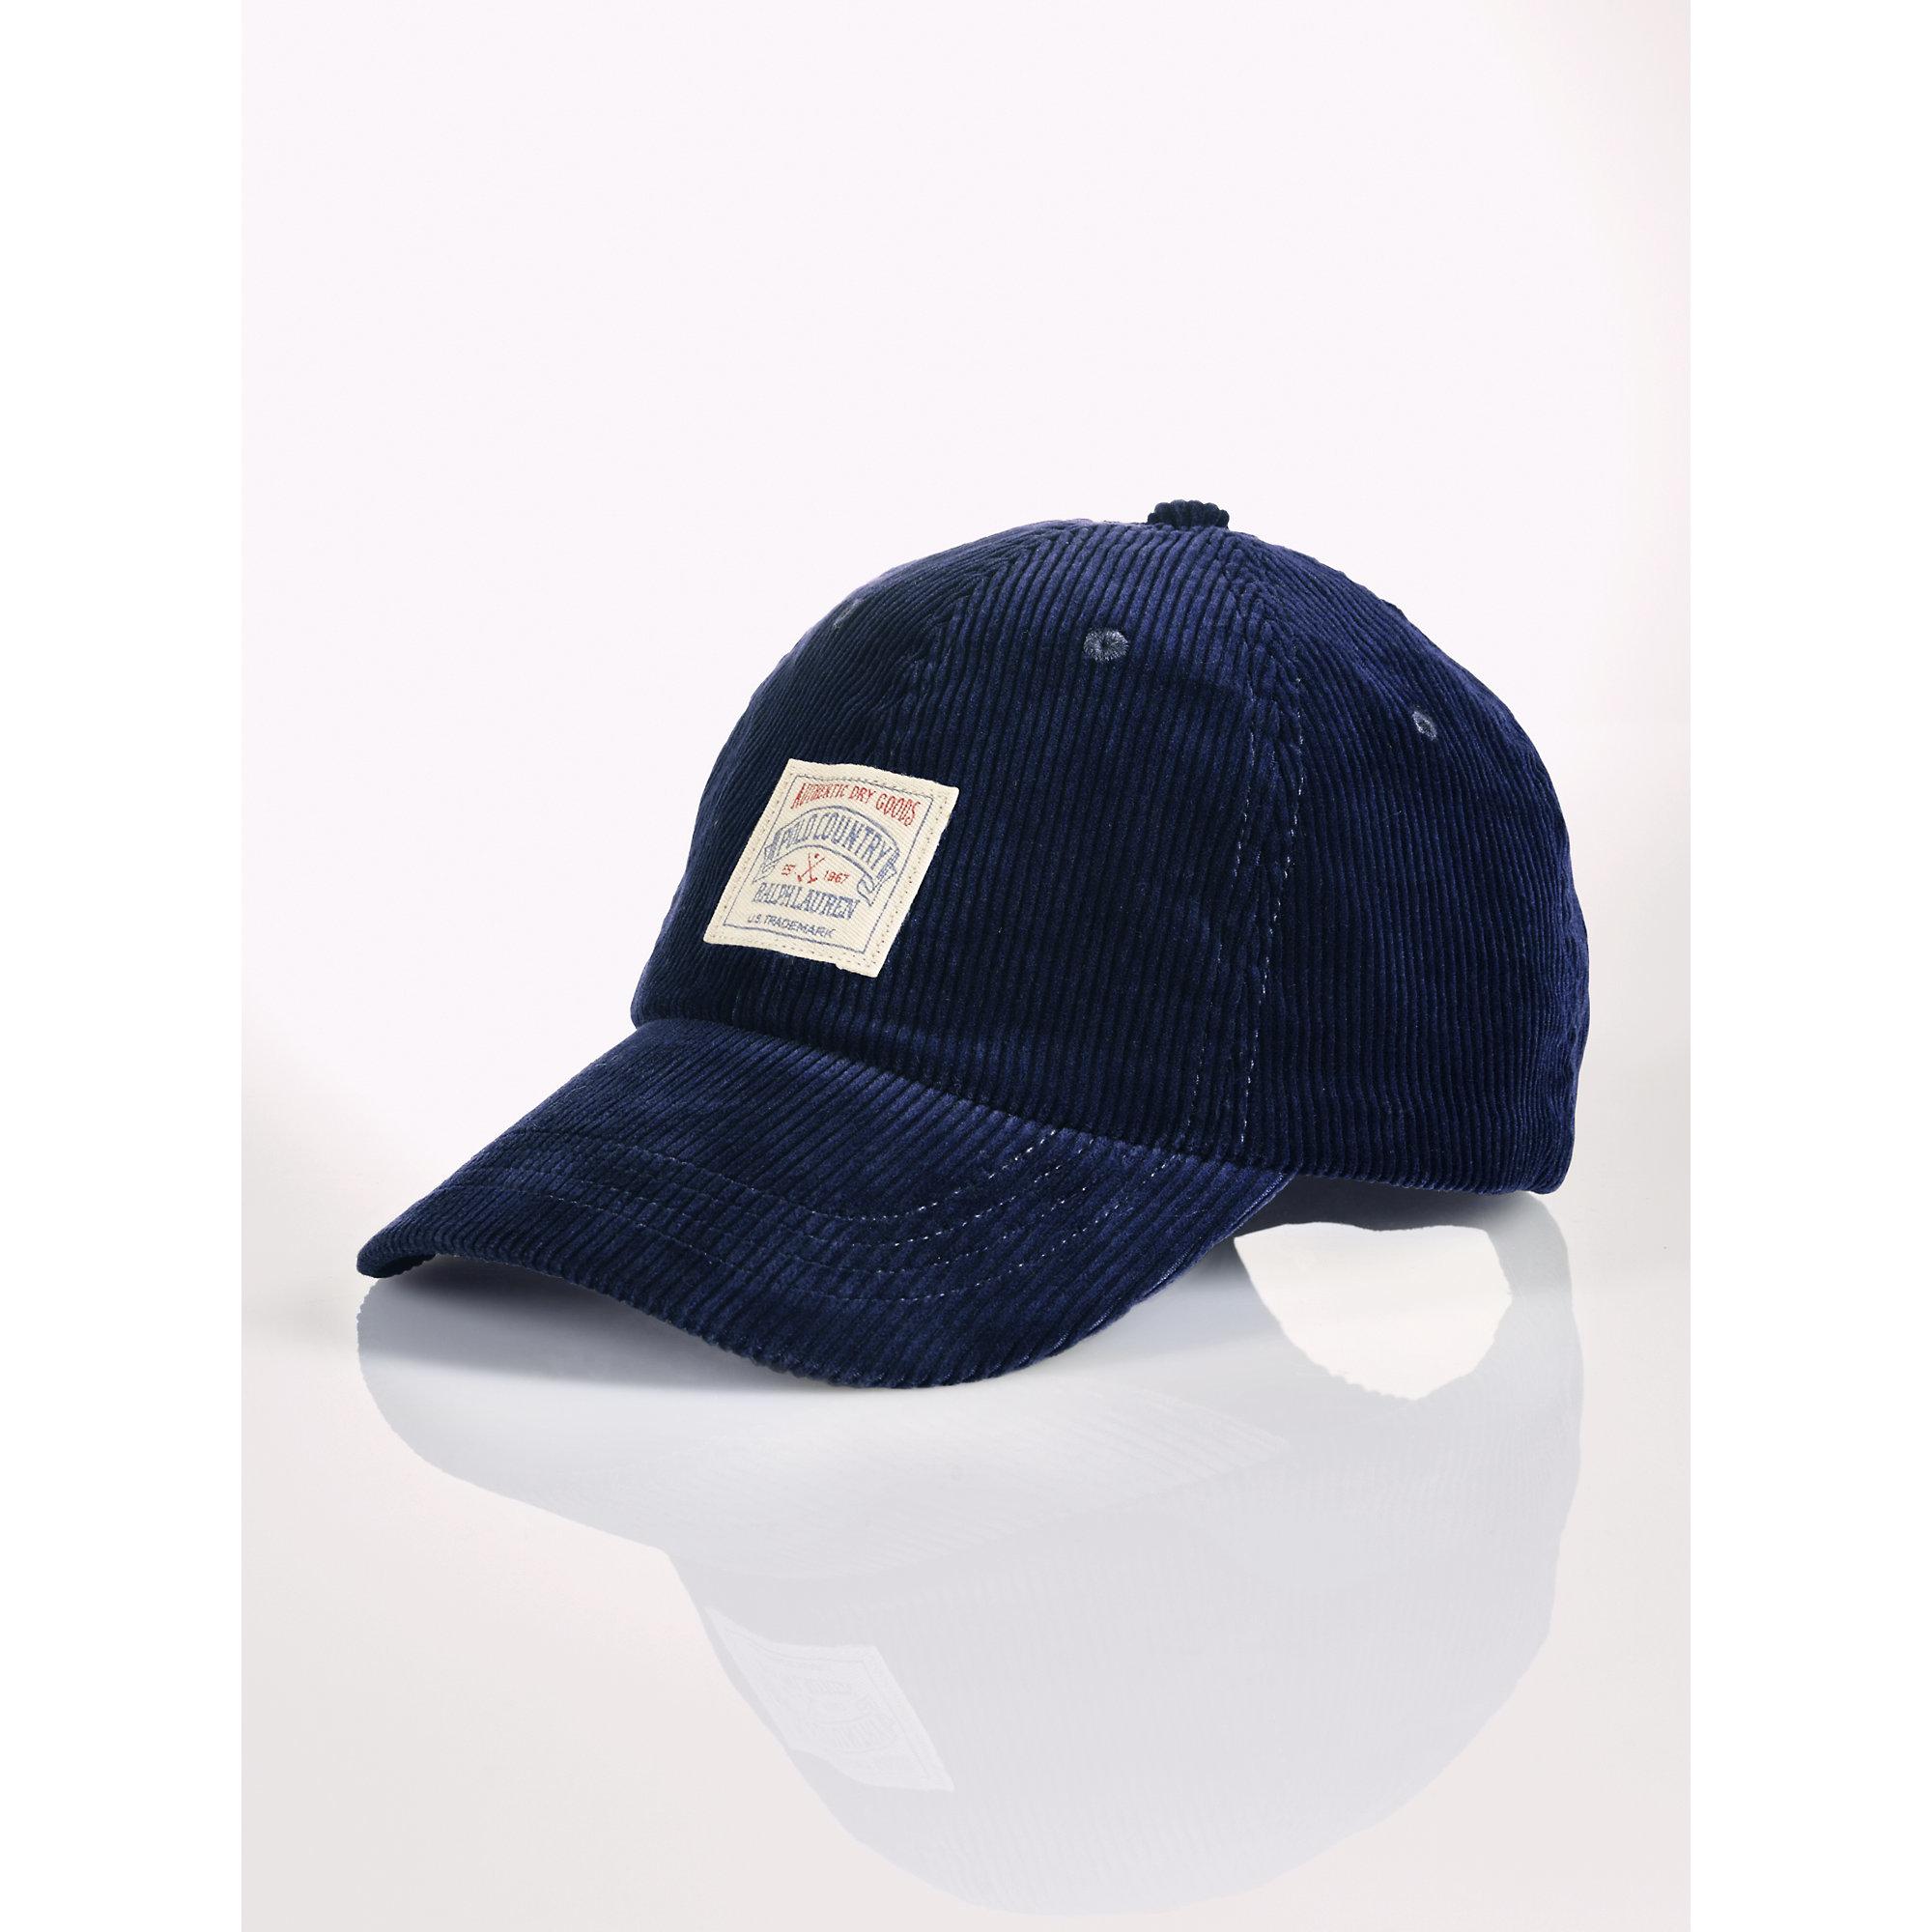 e18f3f3534bb5 Polo Ralph Lauren Corduroy Hat in Blue for Men - Lyst